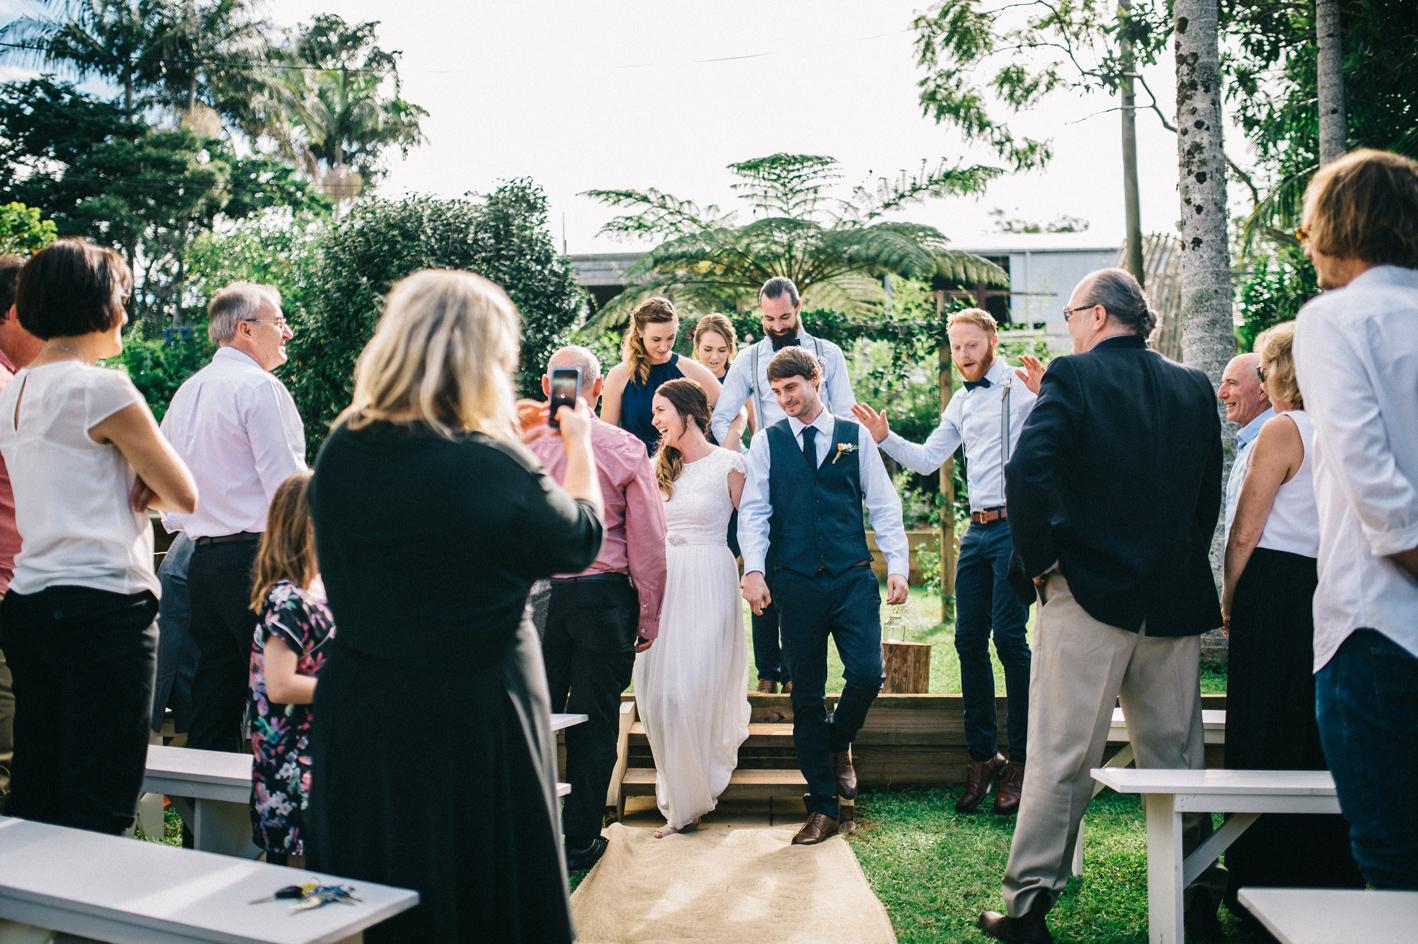 034-michelle-reagan-mount-tamborine-wedding-sophie-baker-photography